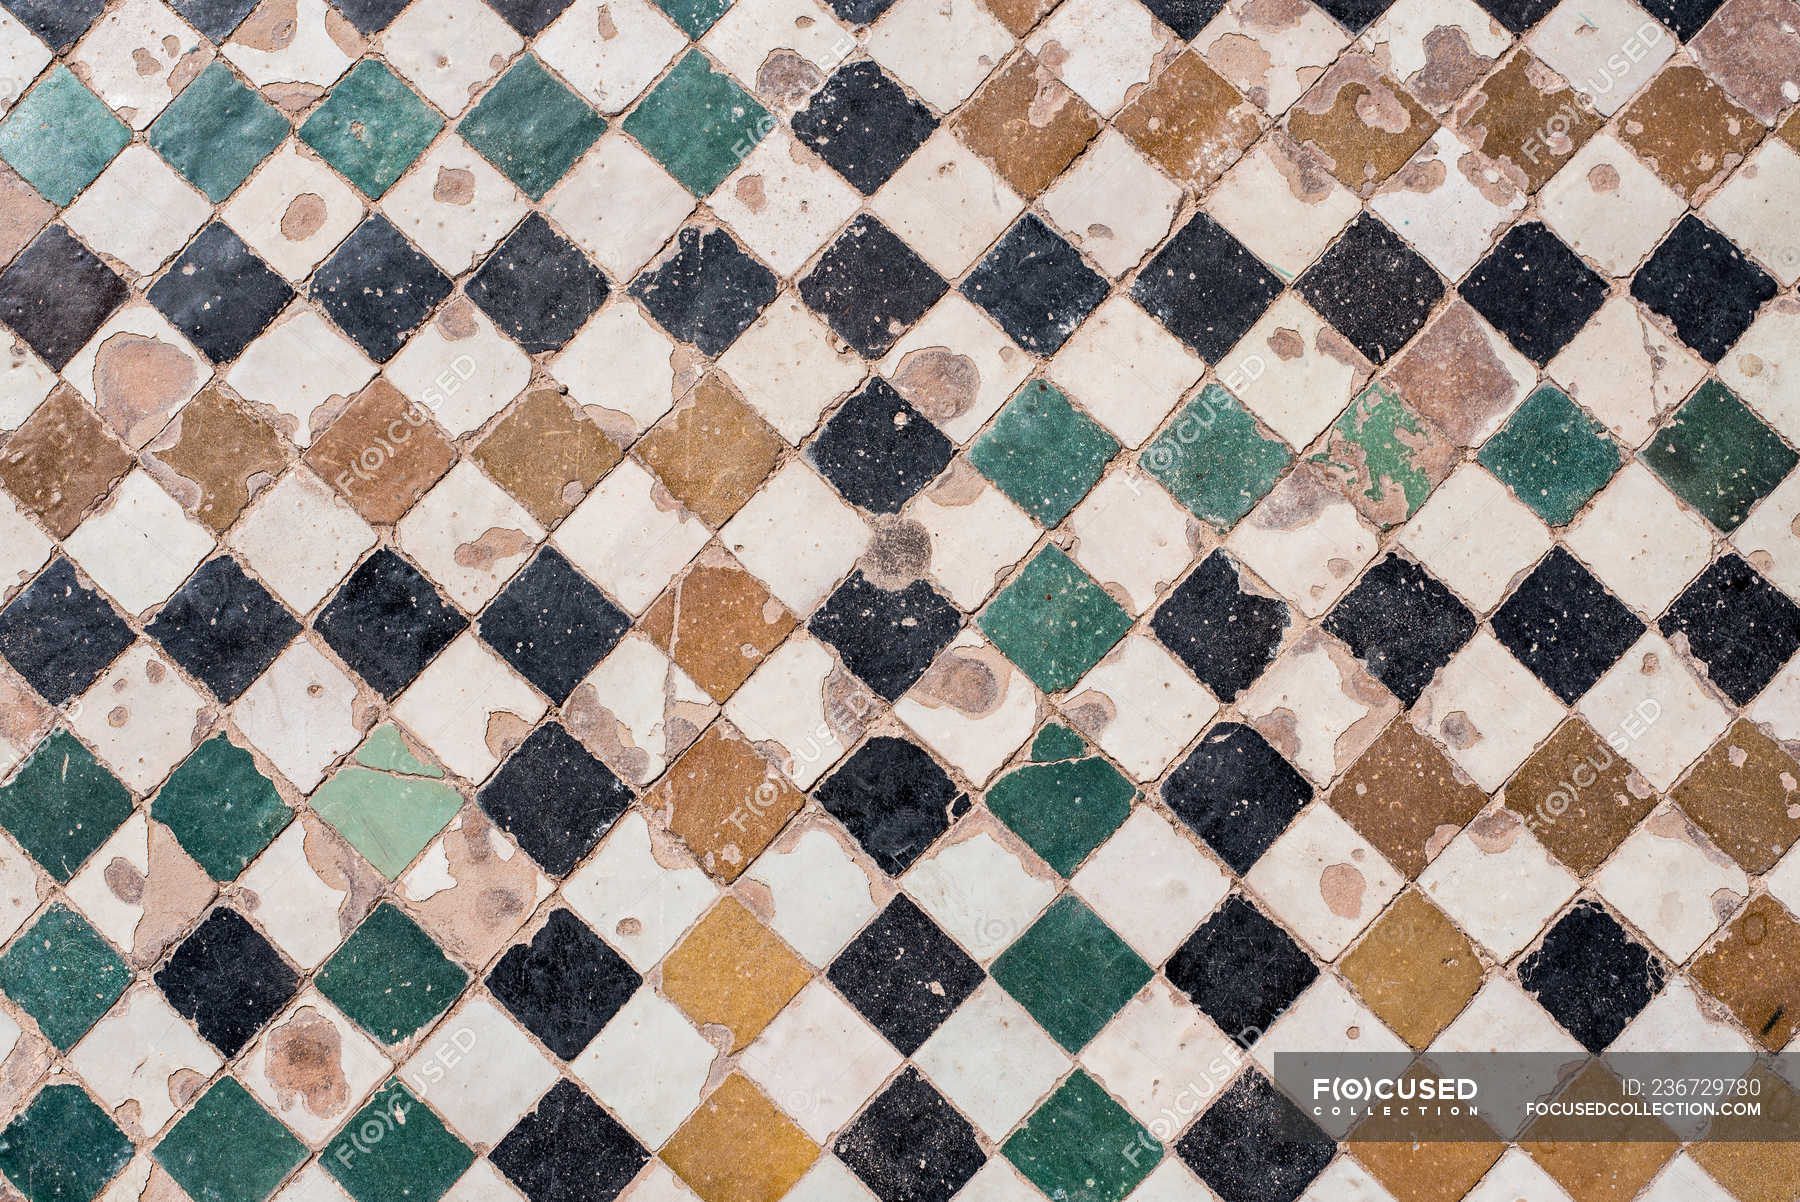 Vintage Handmade Ceramic Tiles Full Frame Interior Oriental Stock Photo 236729780